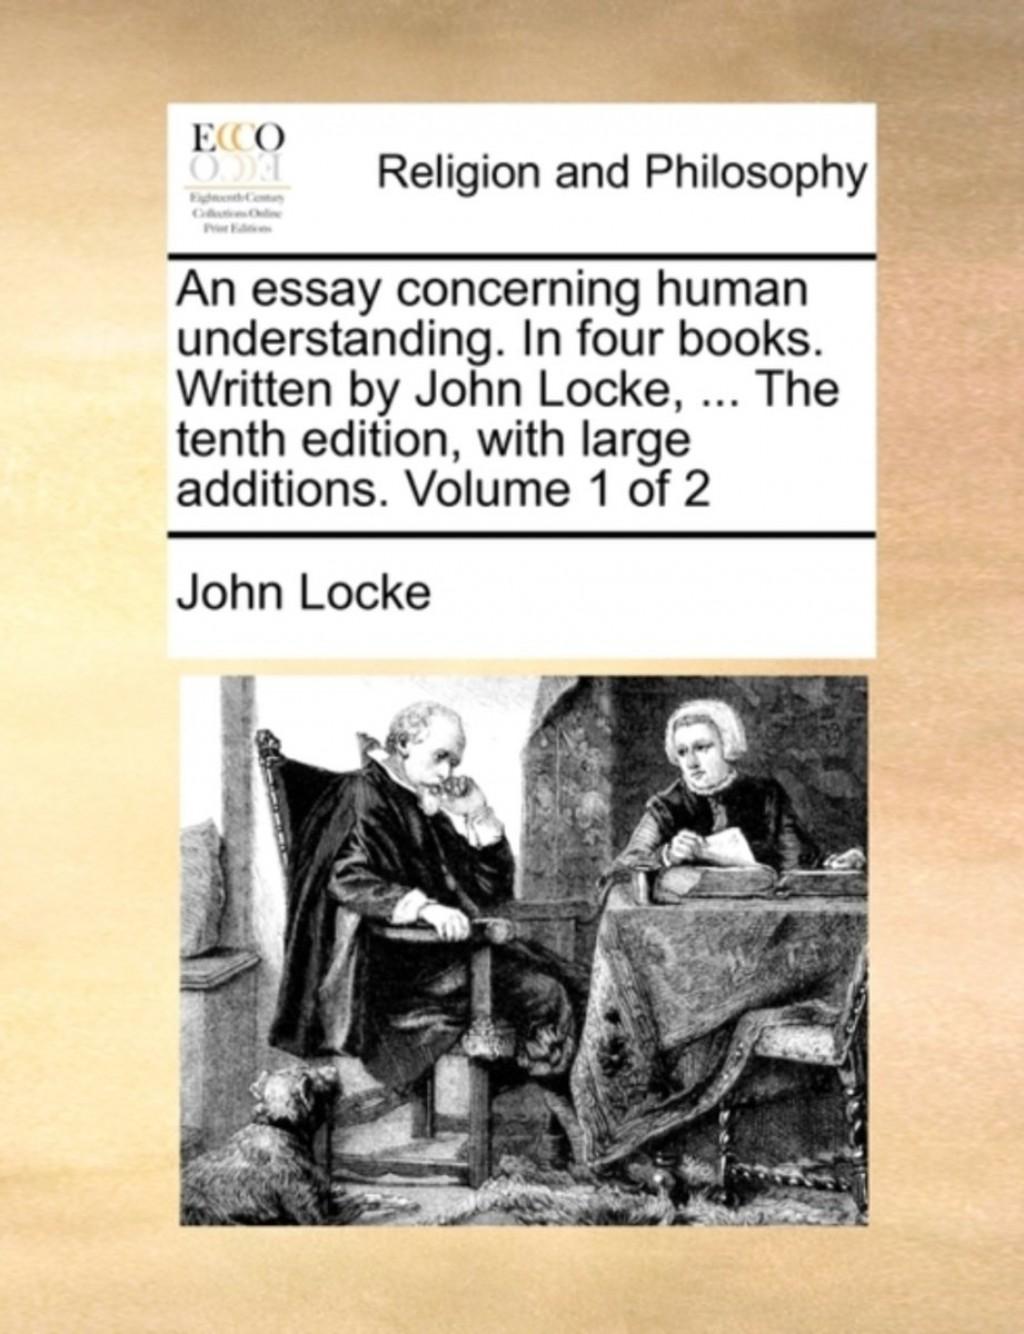 024 Essay Example John Impressive Locke Concerning Human Understanding Book 4 On Pdf Summary Large